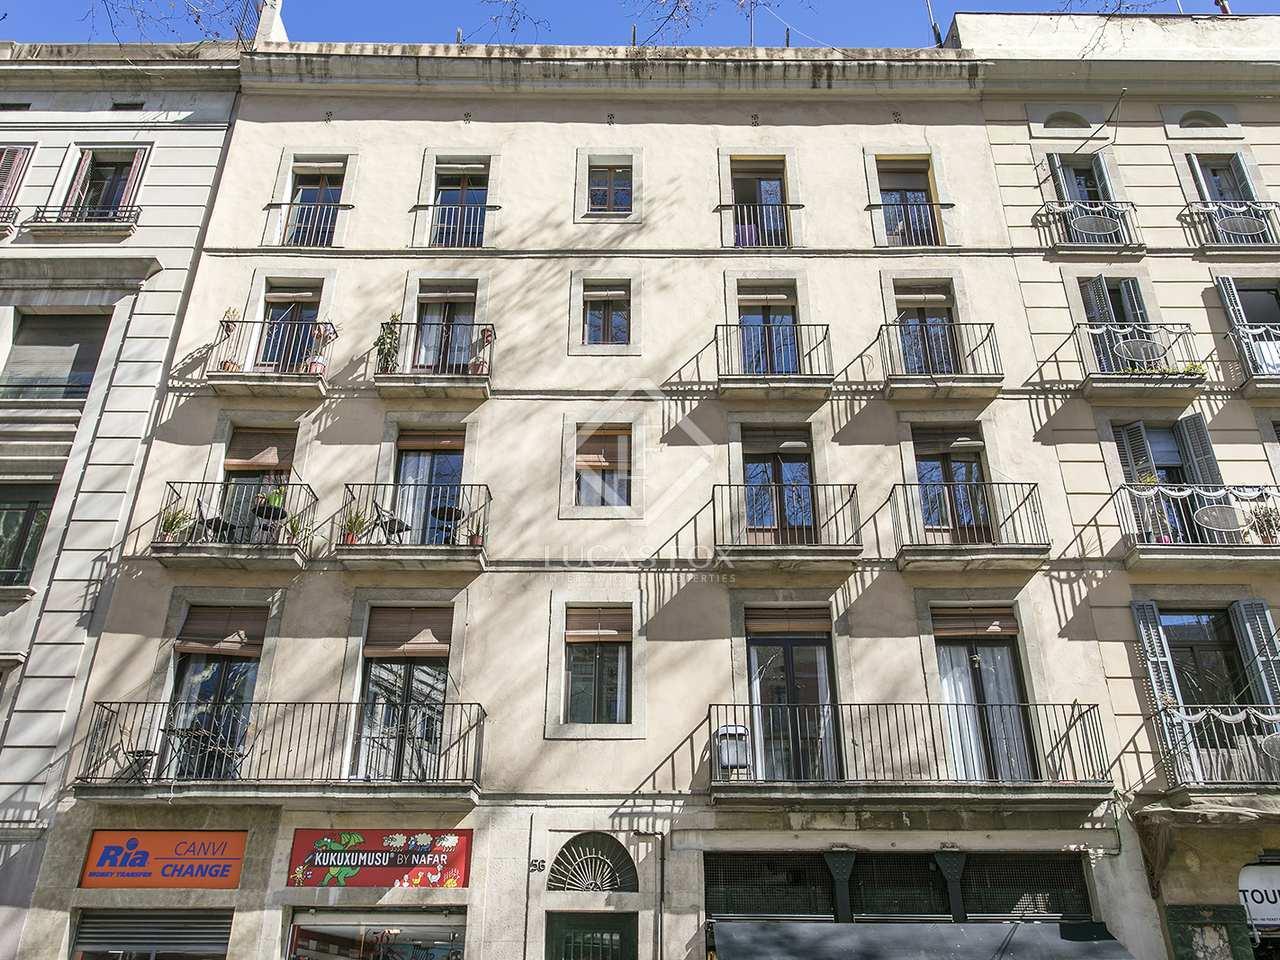 Pis de 75m en lloguer a g tico barcelona - Lloguer pis barcelona particular ...